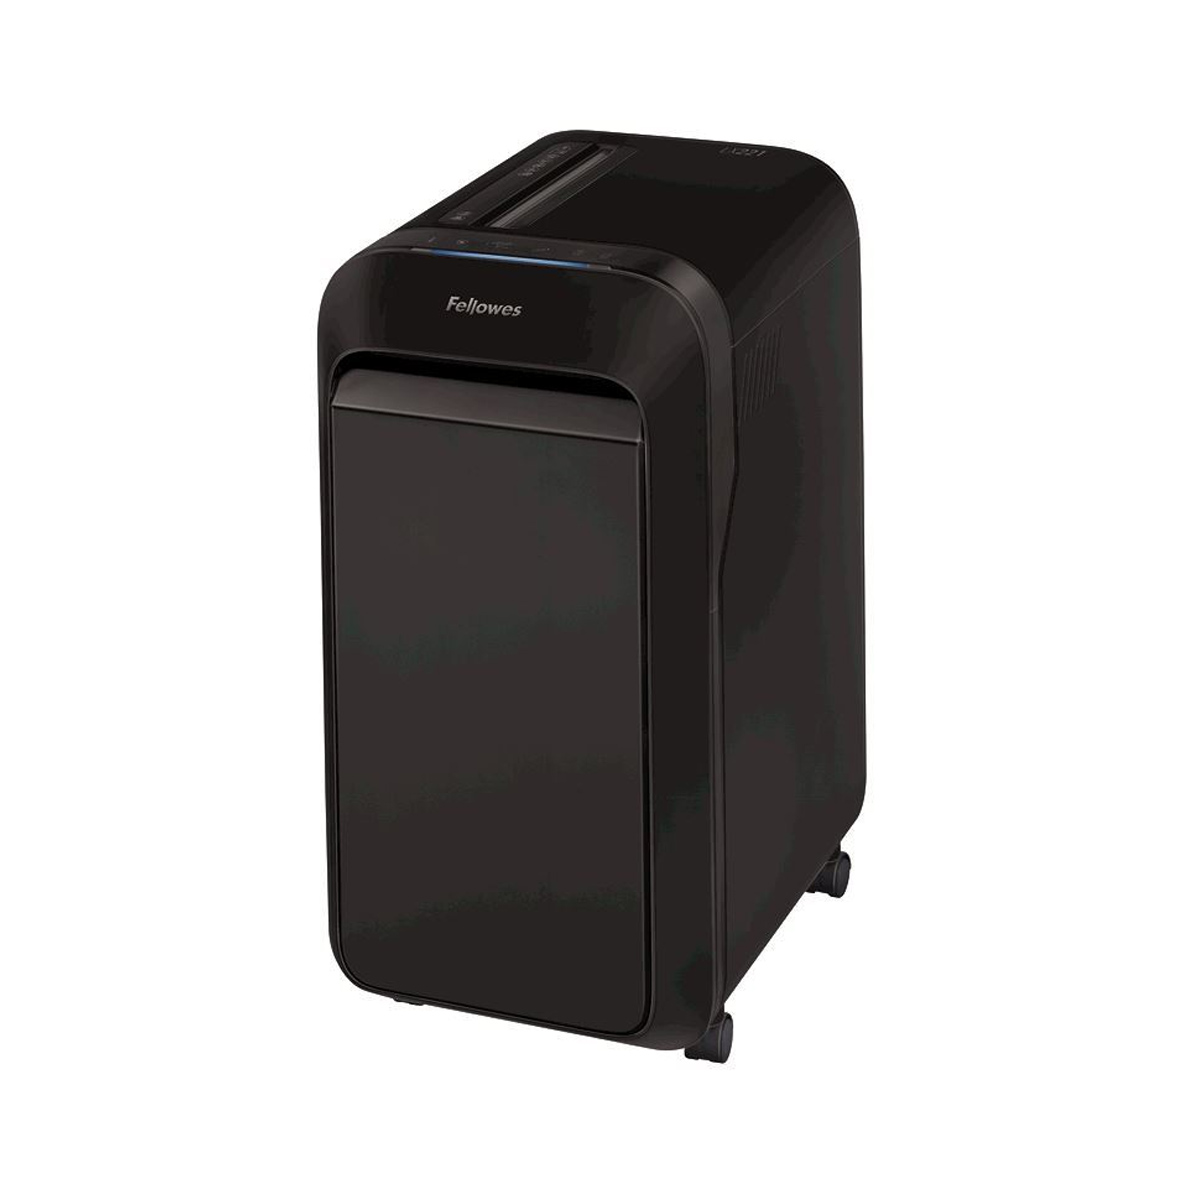 Fellowes Powershred® LX221 Micro-Cut 5050401 Black